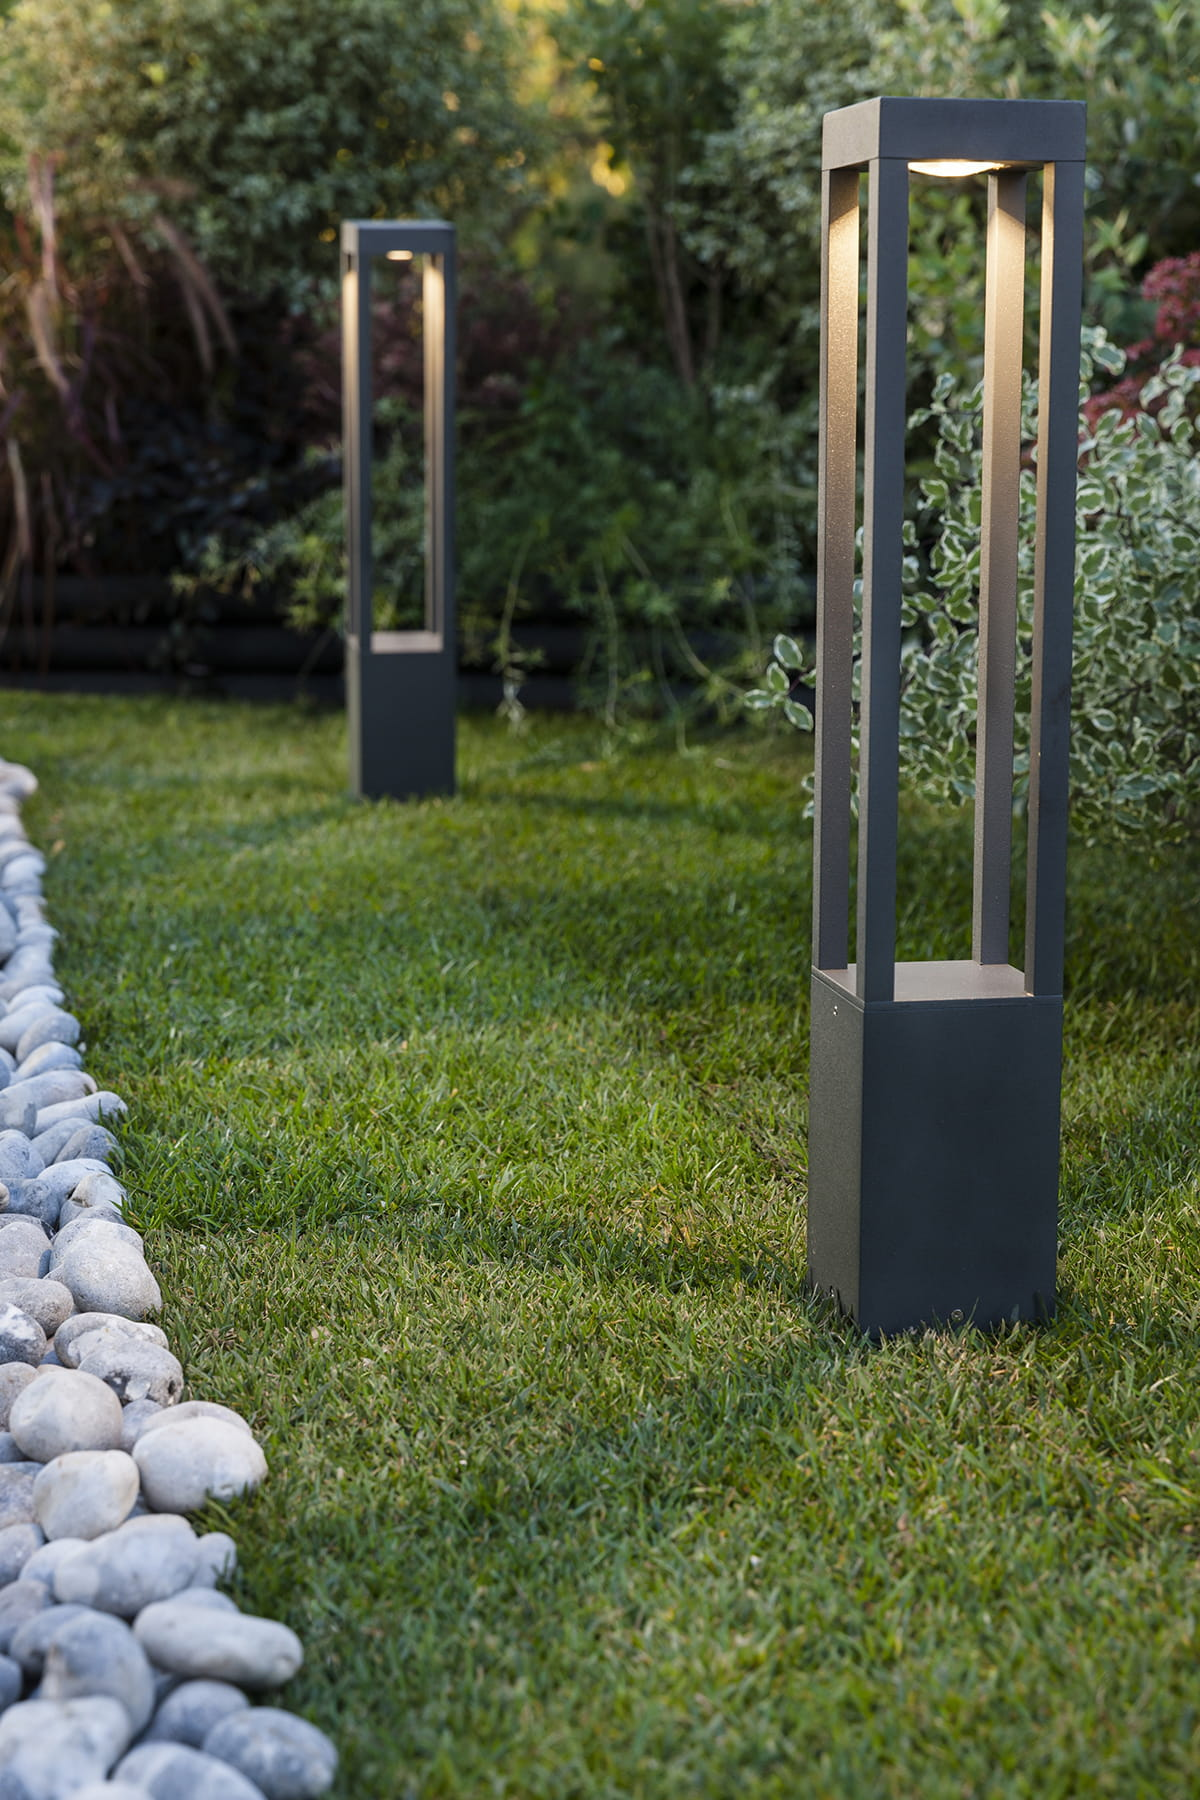 Une borne de lumi re diffuse clairage de jardin 20 for Lumiere de jardin